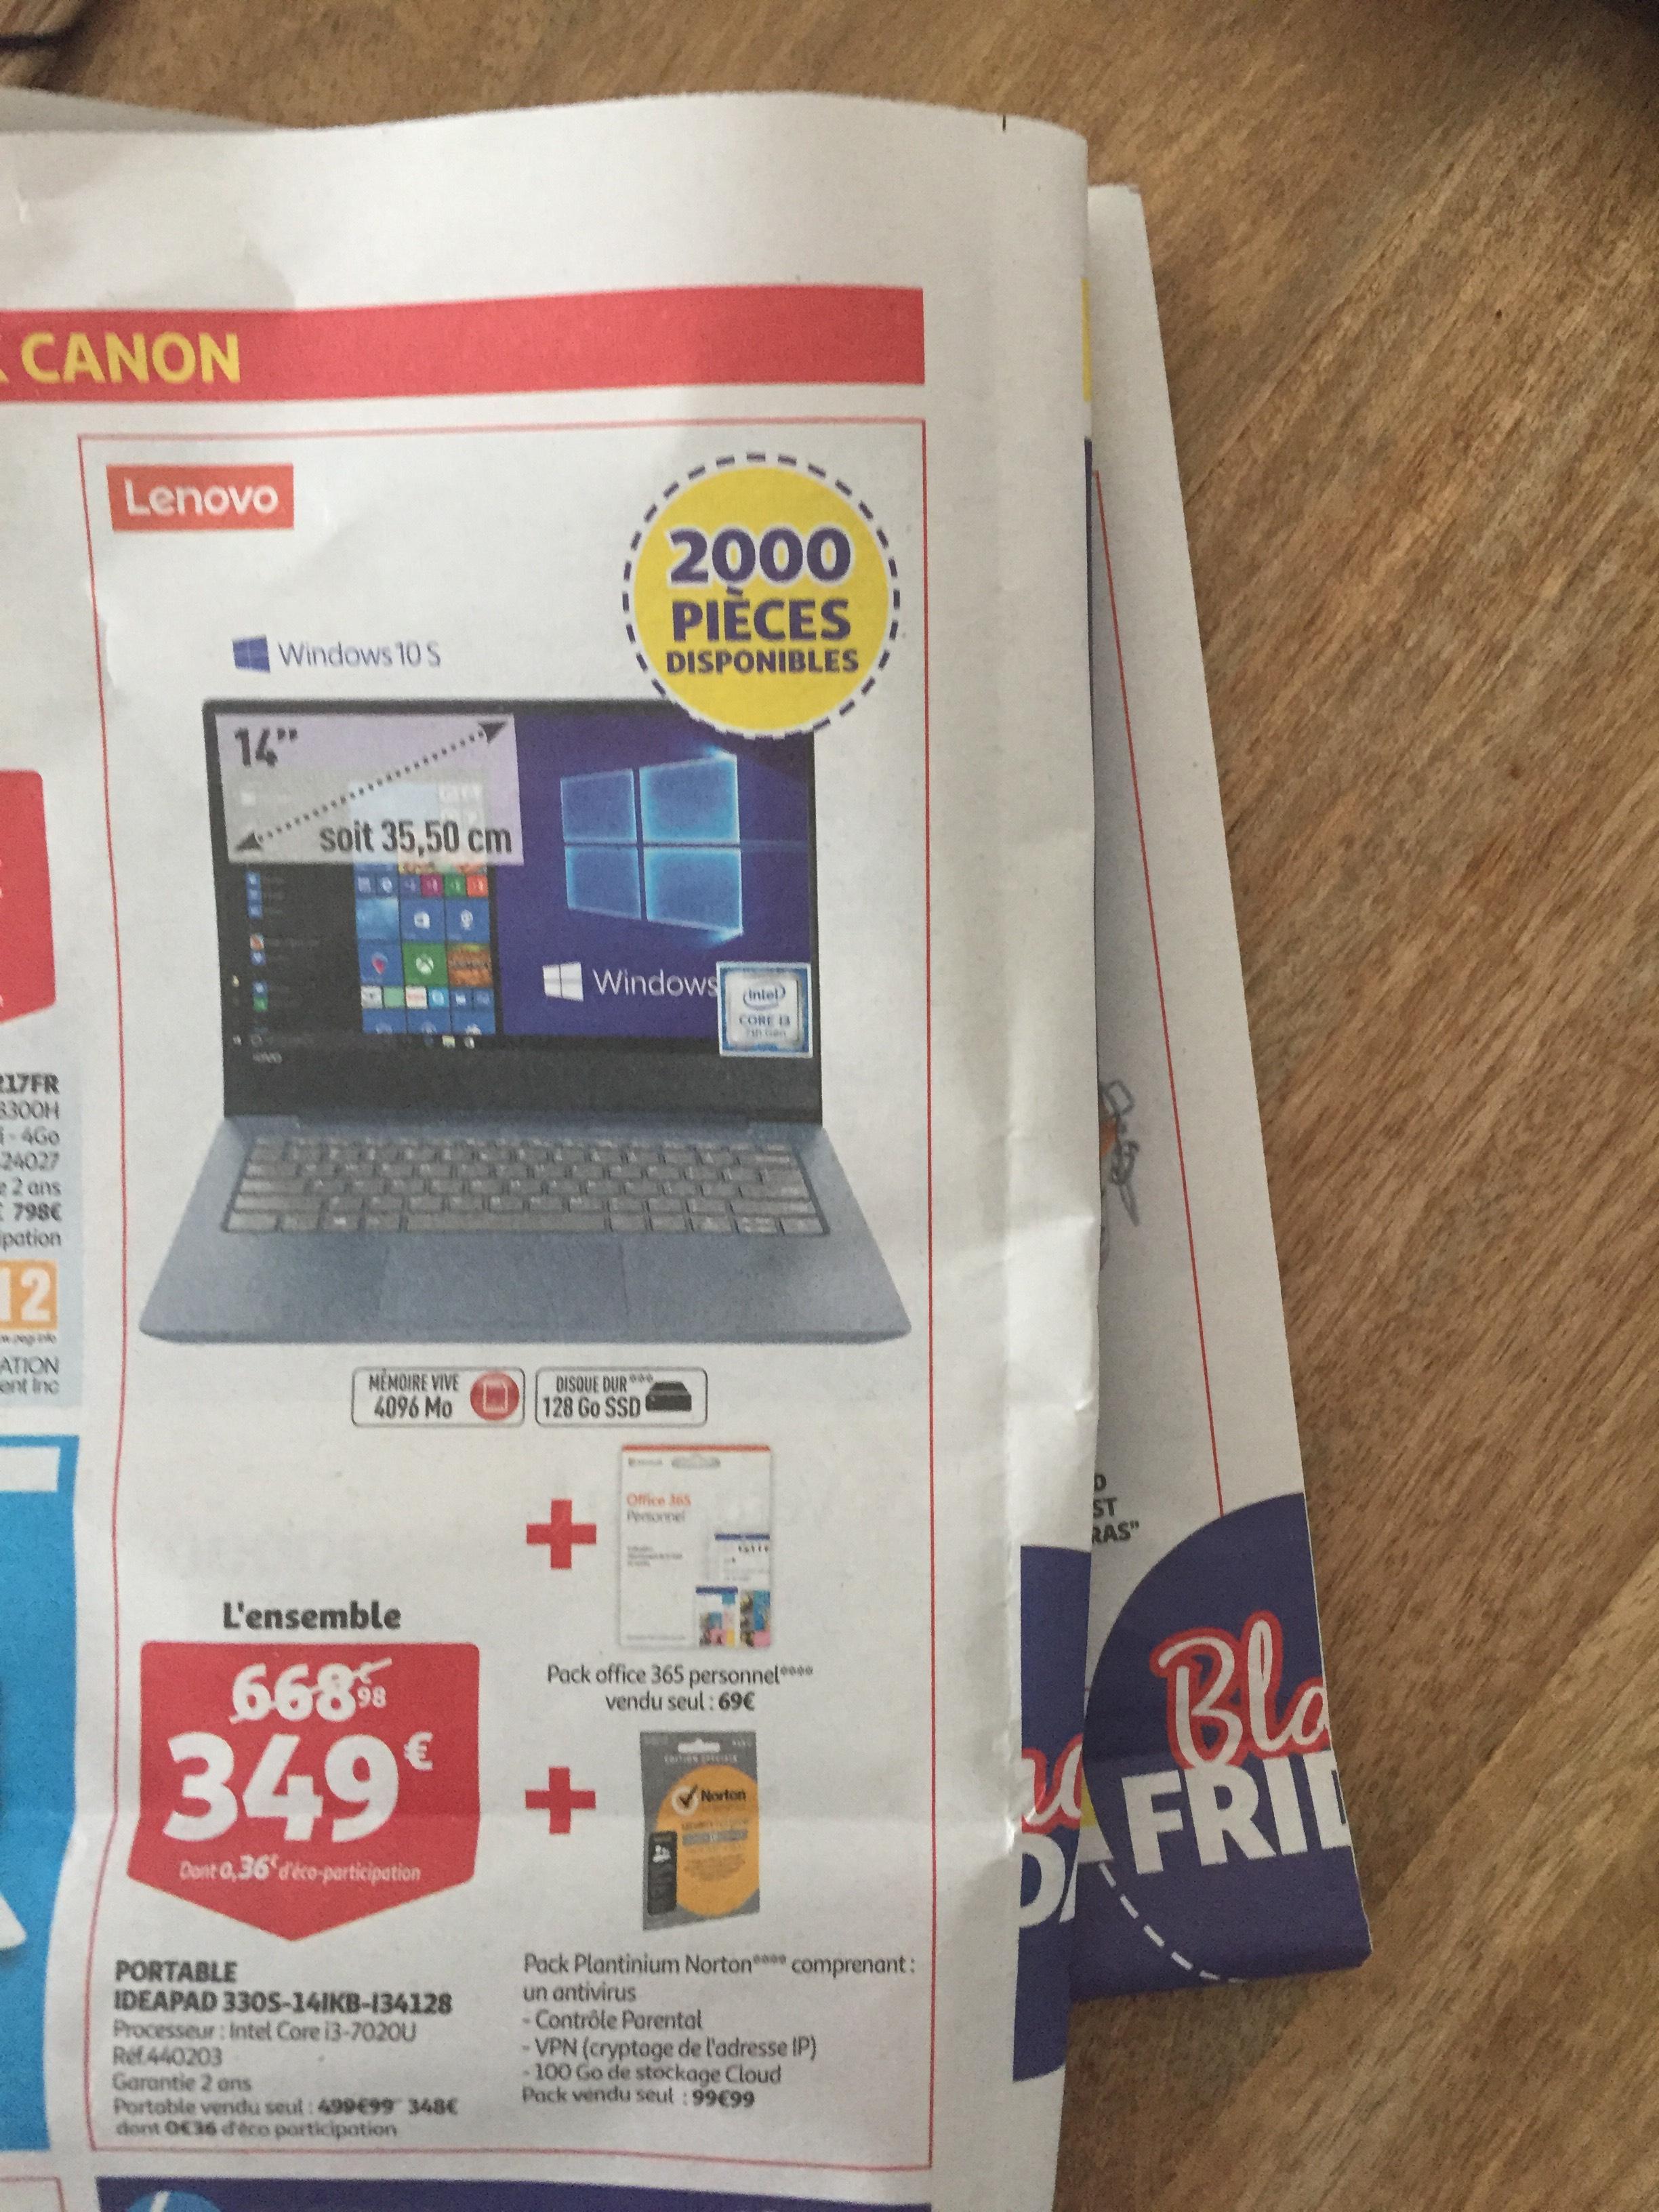 "PC portable 14"" Lenovo IdeaPad 330S-14IKB-I34128 (i3-7020U, 4 Go de RAM, 128 Go en SSD) + un an à Office 365 + antivirus Norton Platinium"